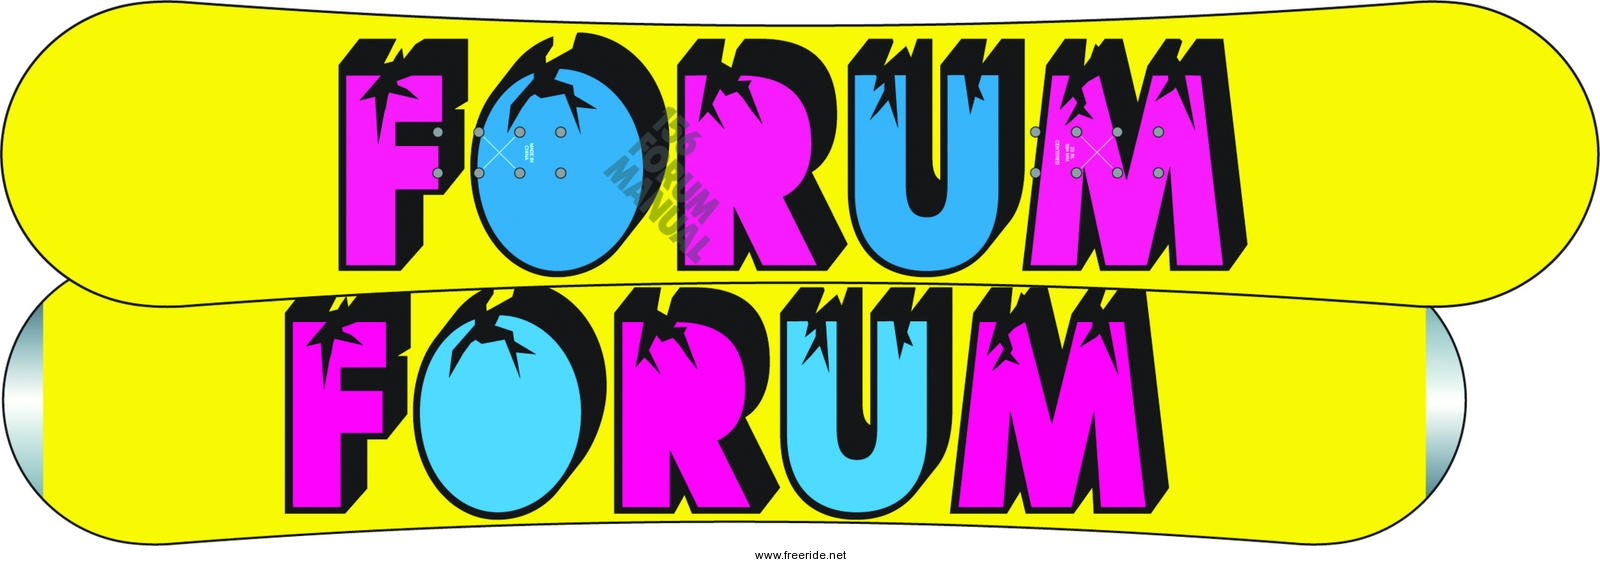 forum manual freeride rh freeride com Homelite 240 Chainsaw Manual vBulletin Manual